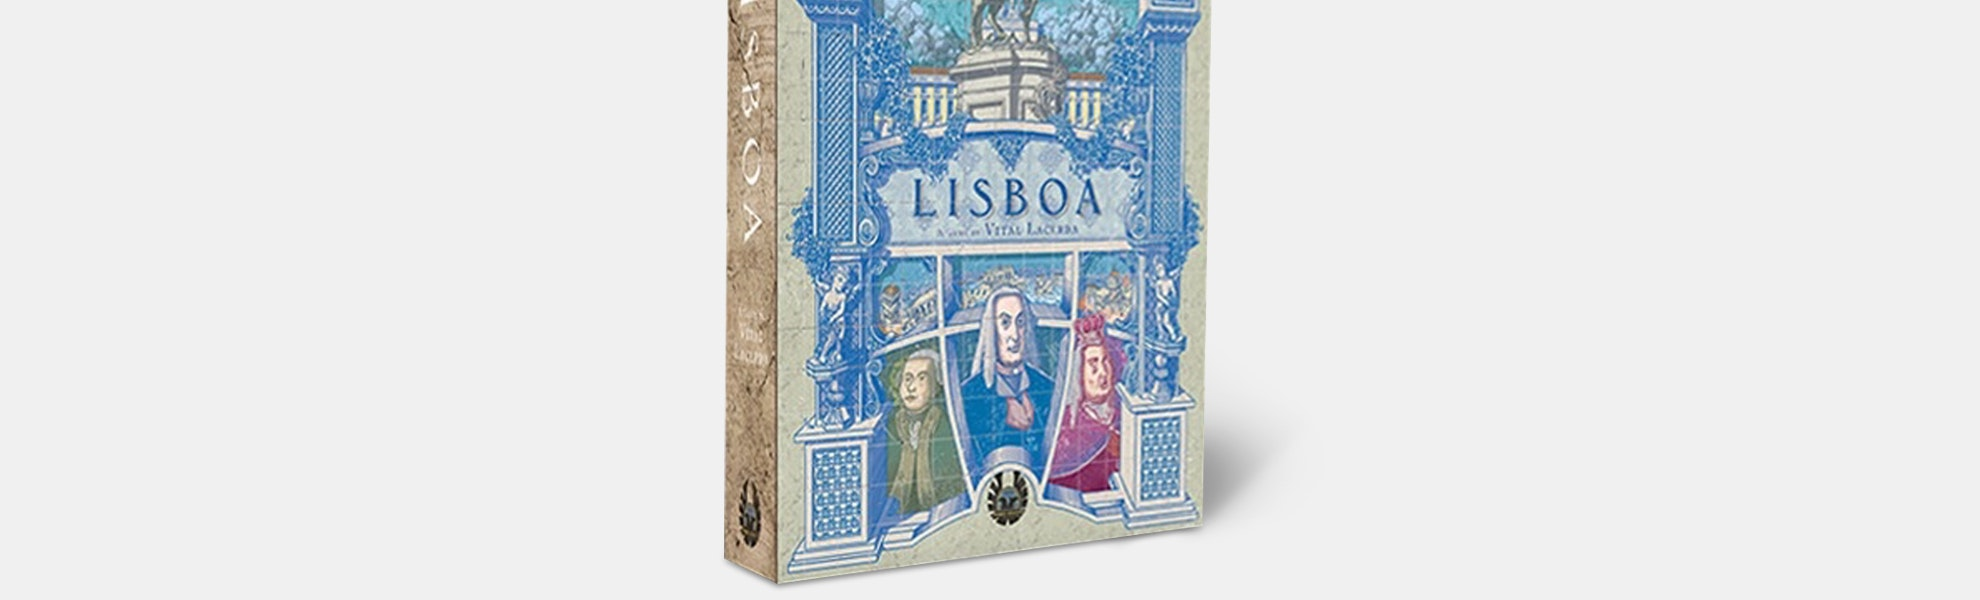 Lisboa Board Game by Vital Lacerda